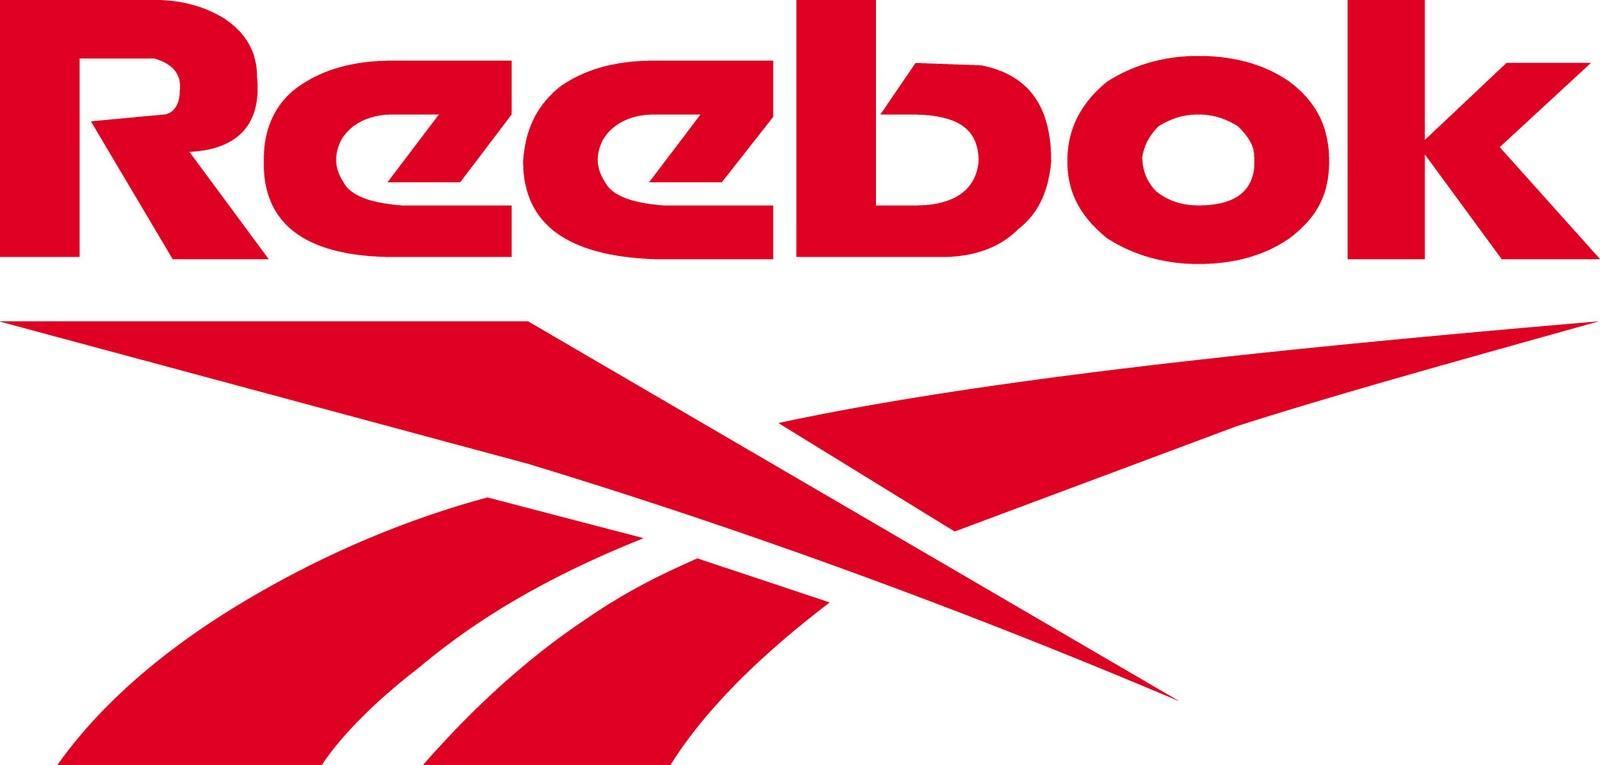 reebok_logo_1996-98.jpg 1,600×765 pixels